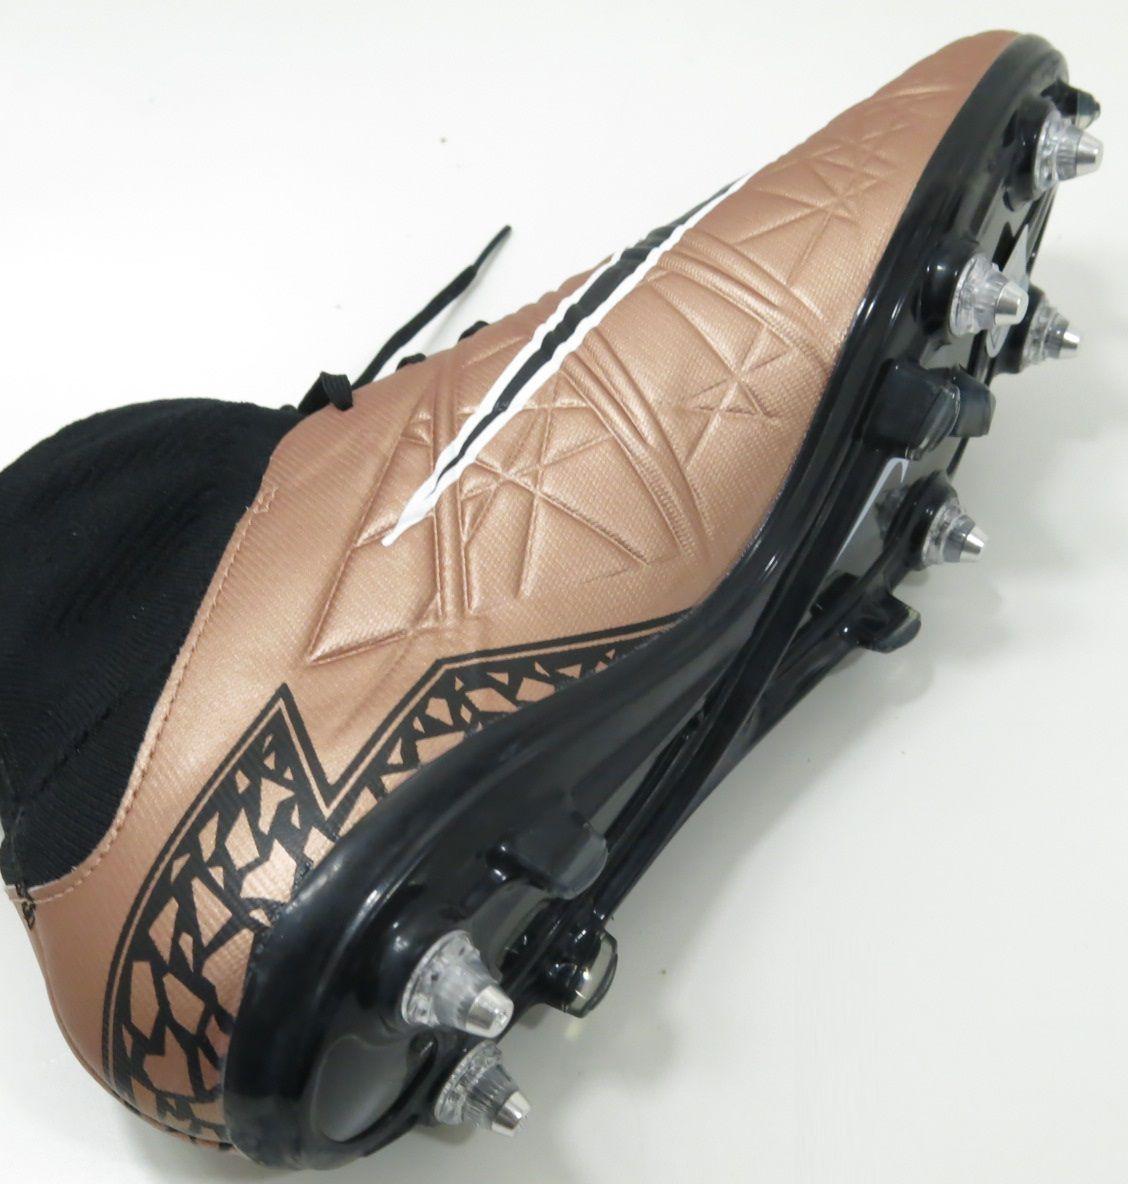 Chuteira Nike Hypervenom Phatal SG-Pro Trava Mista